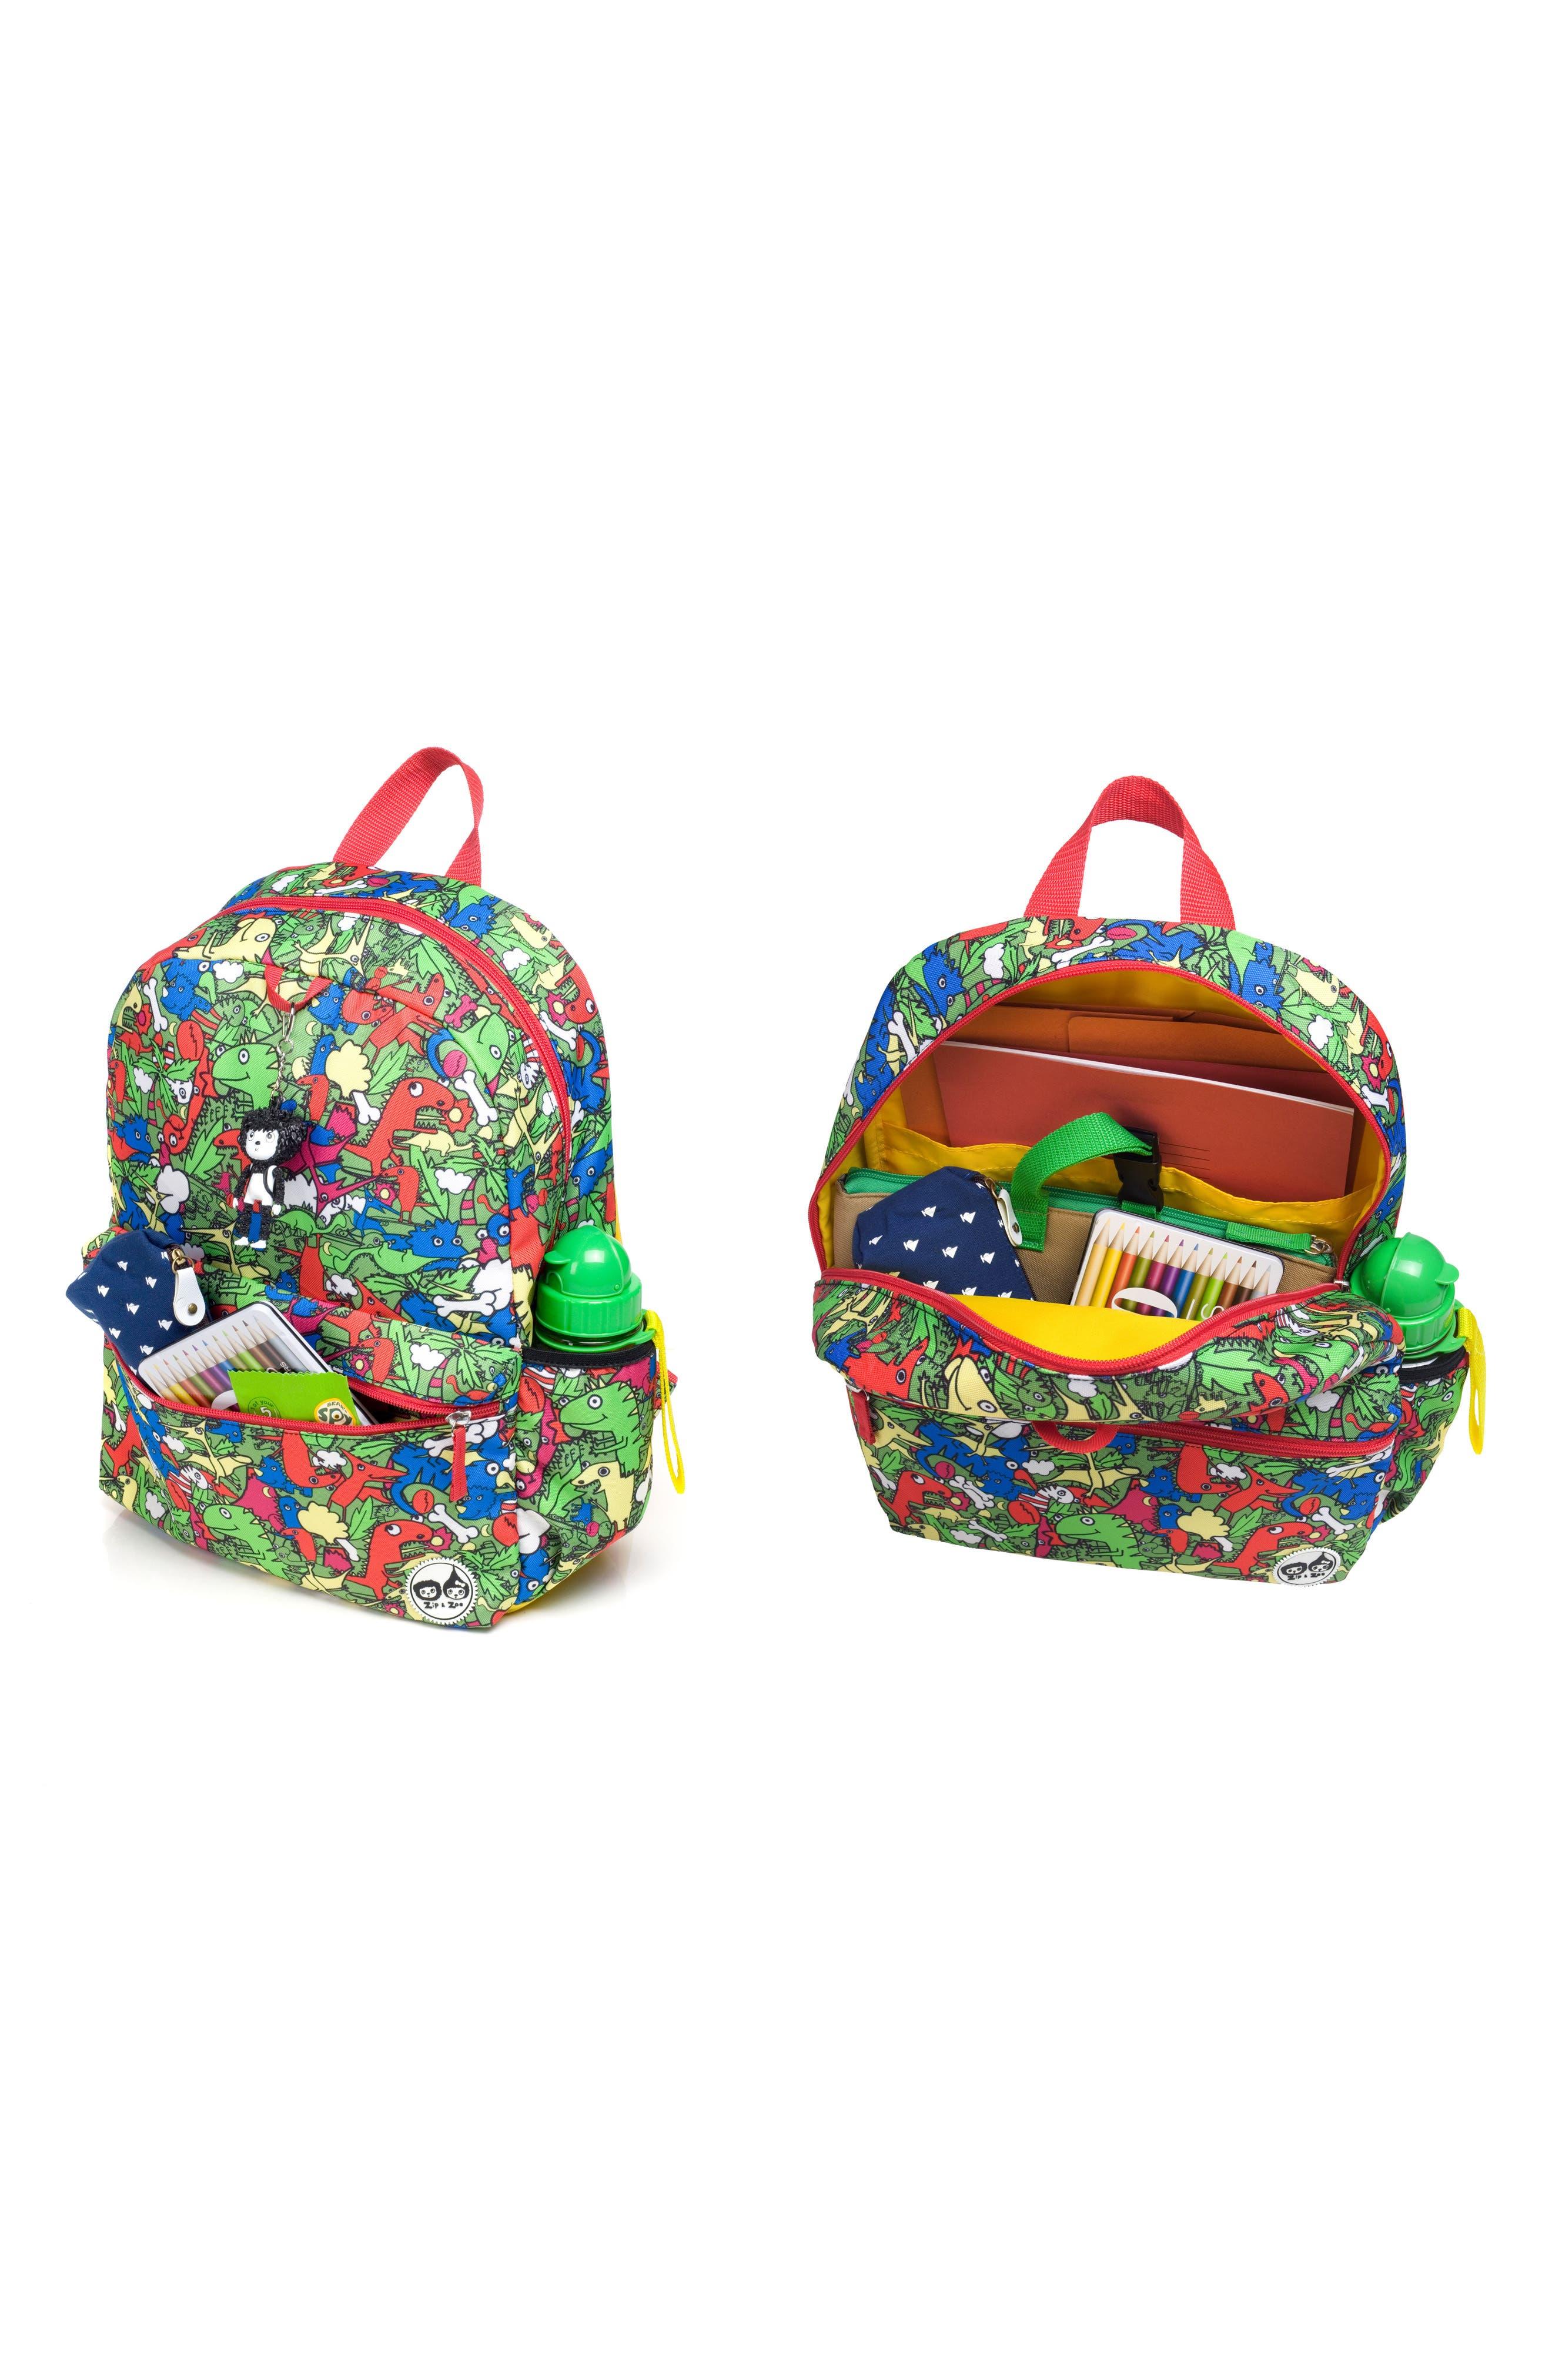 Zip & Zoe Junior Backpack Set,                             Alternate thumbnail 4, color,                             300